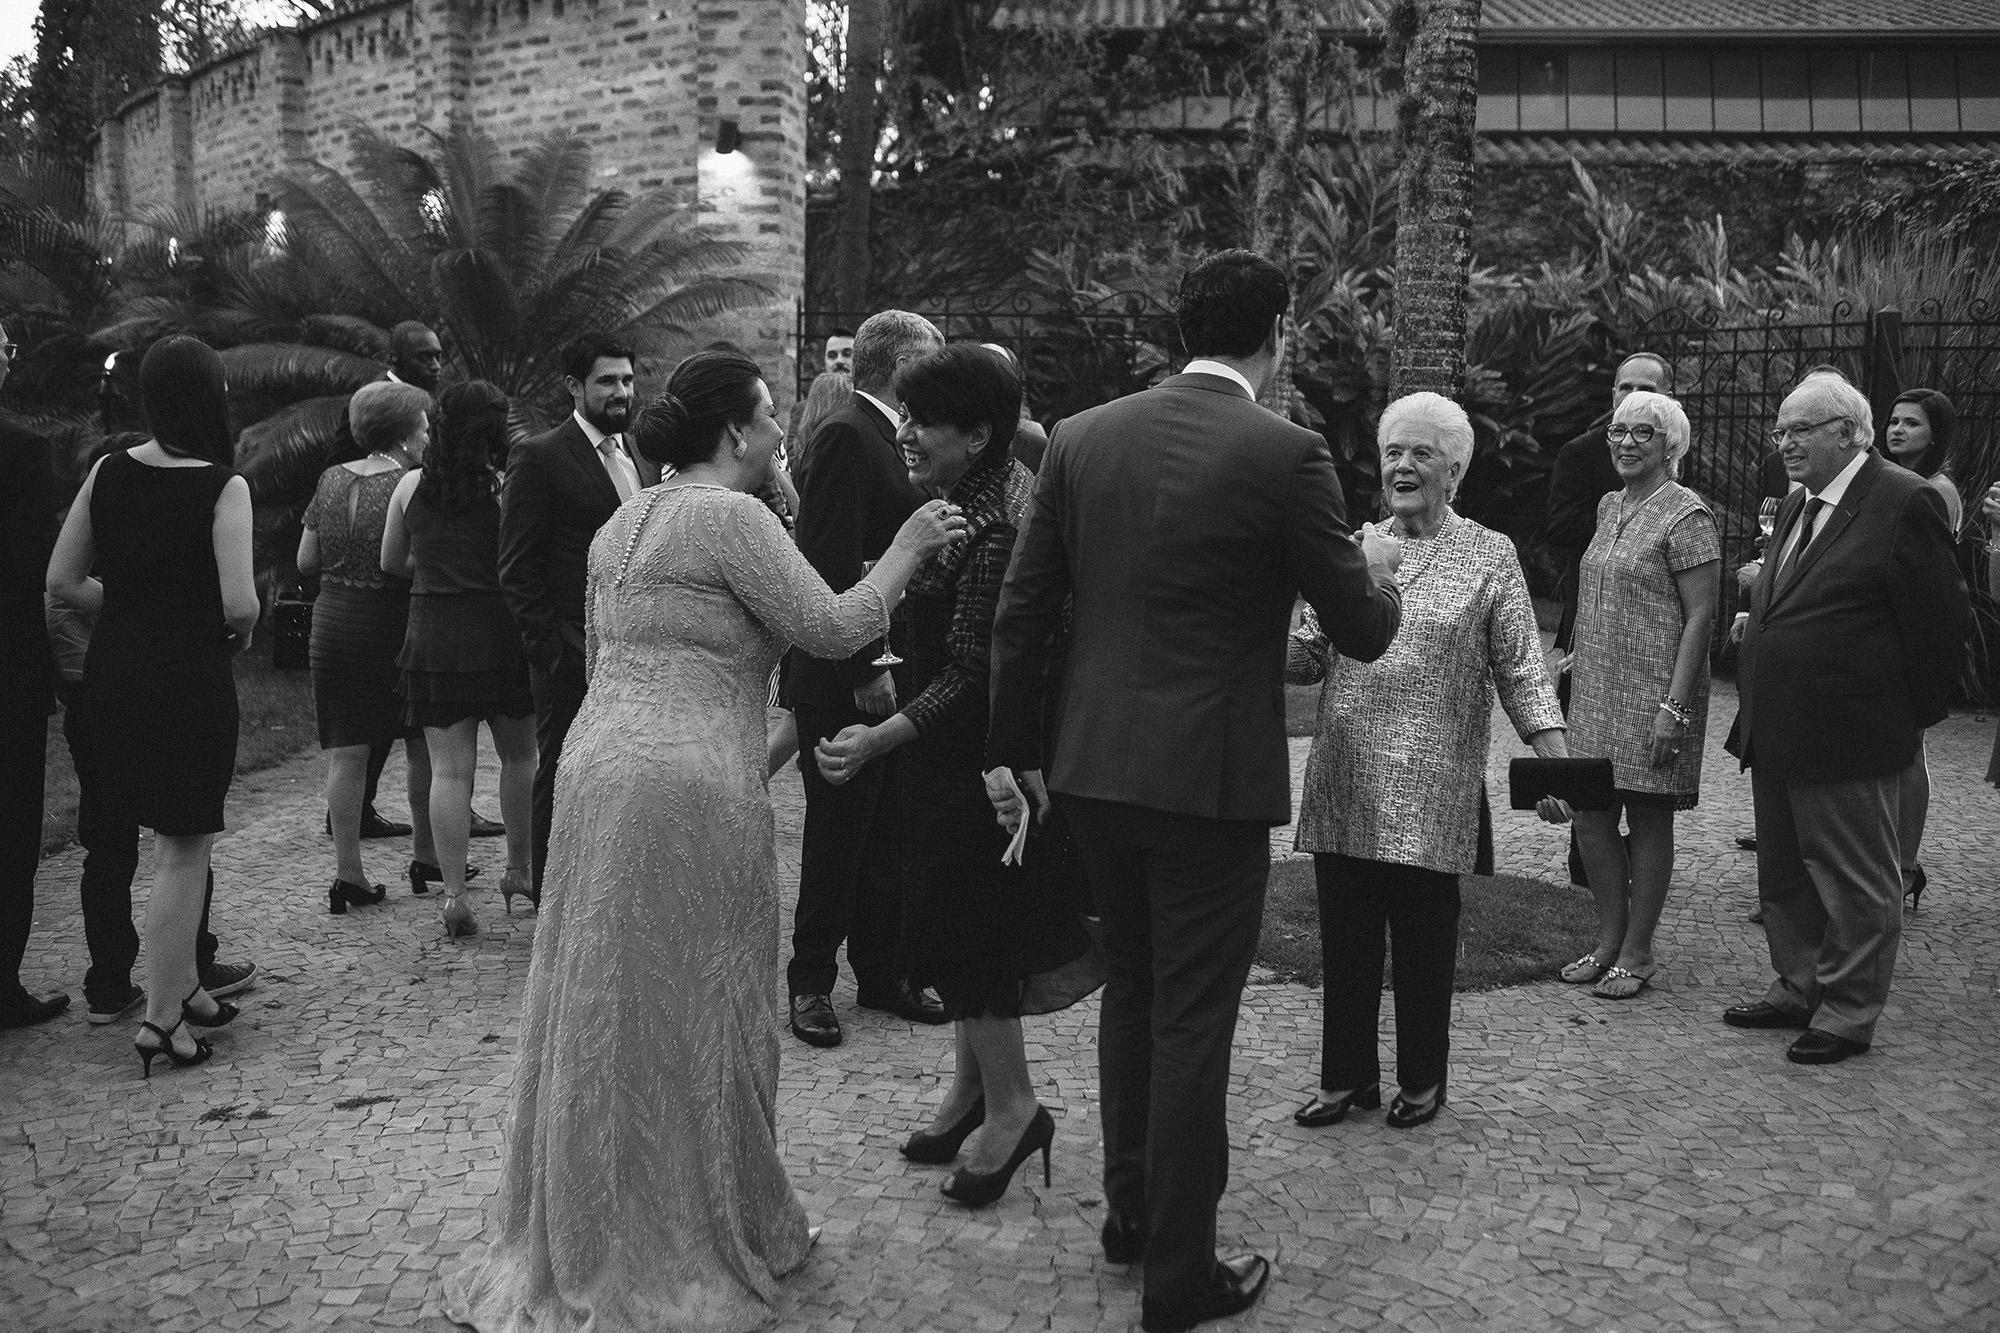 Marina e Guto - Gustavo Semeghini - 002.jpg